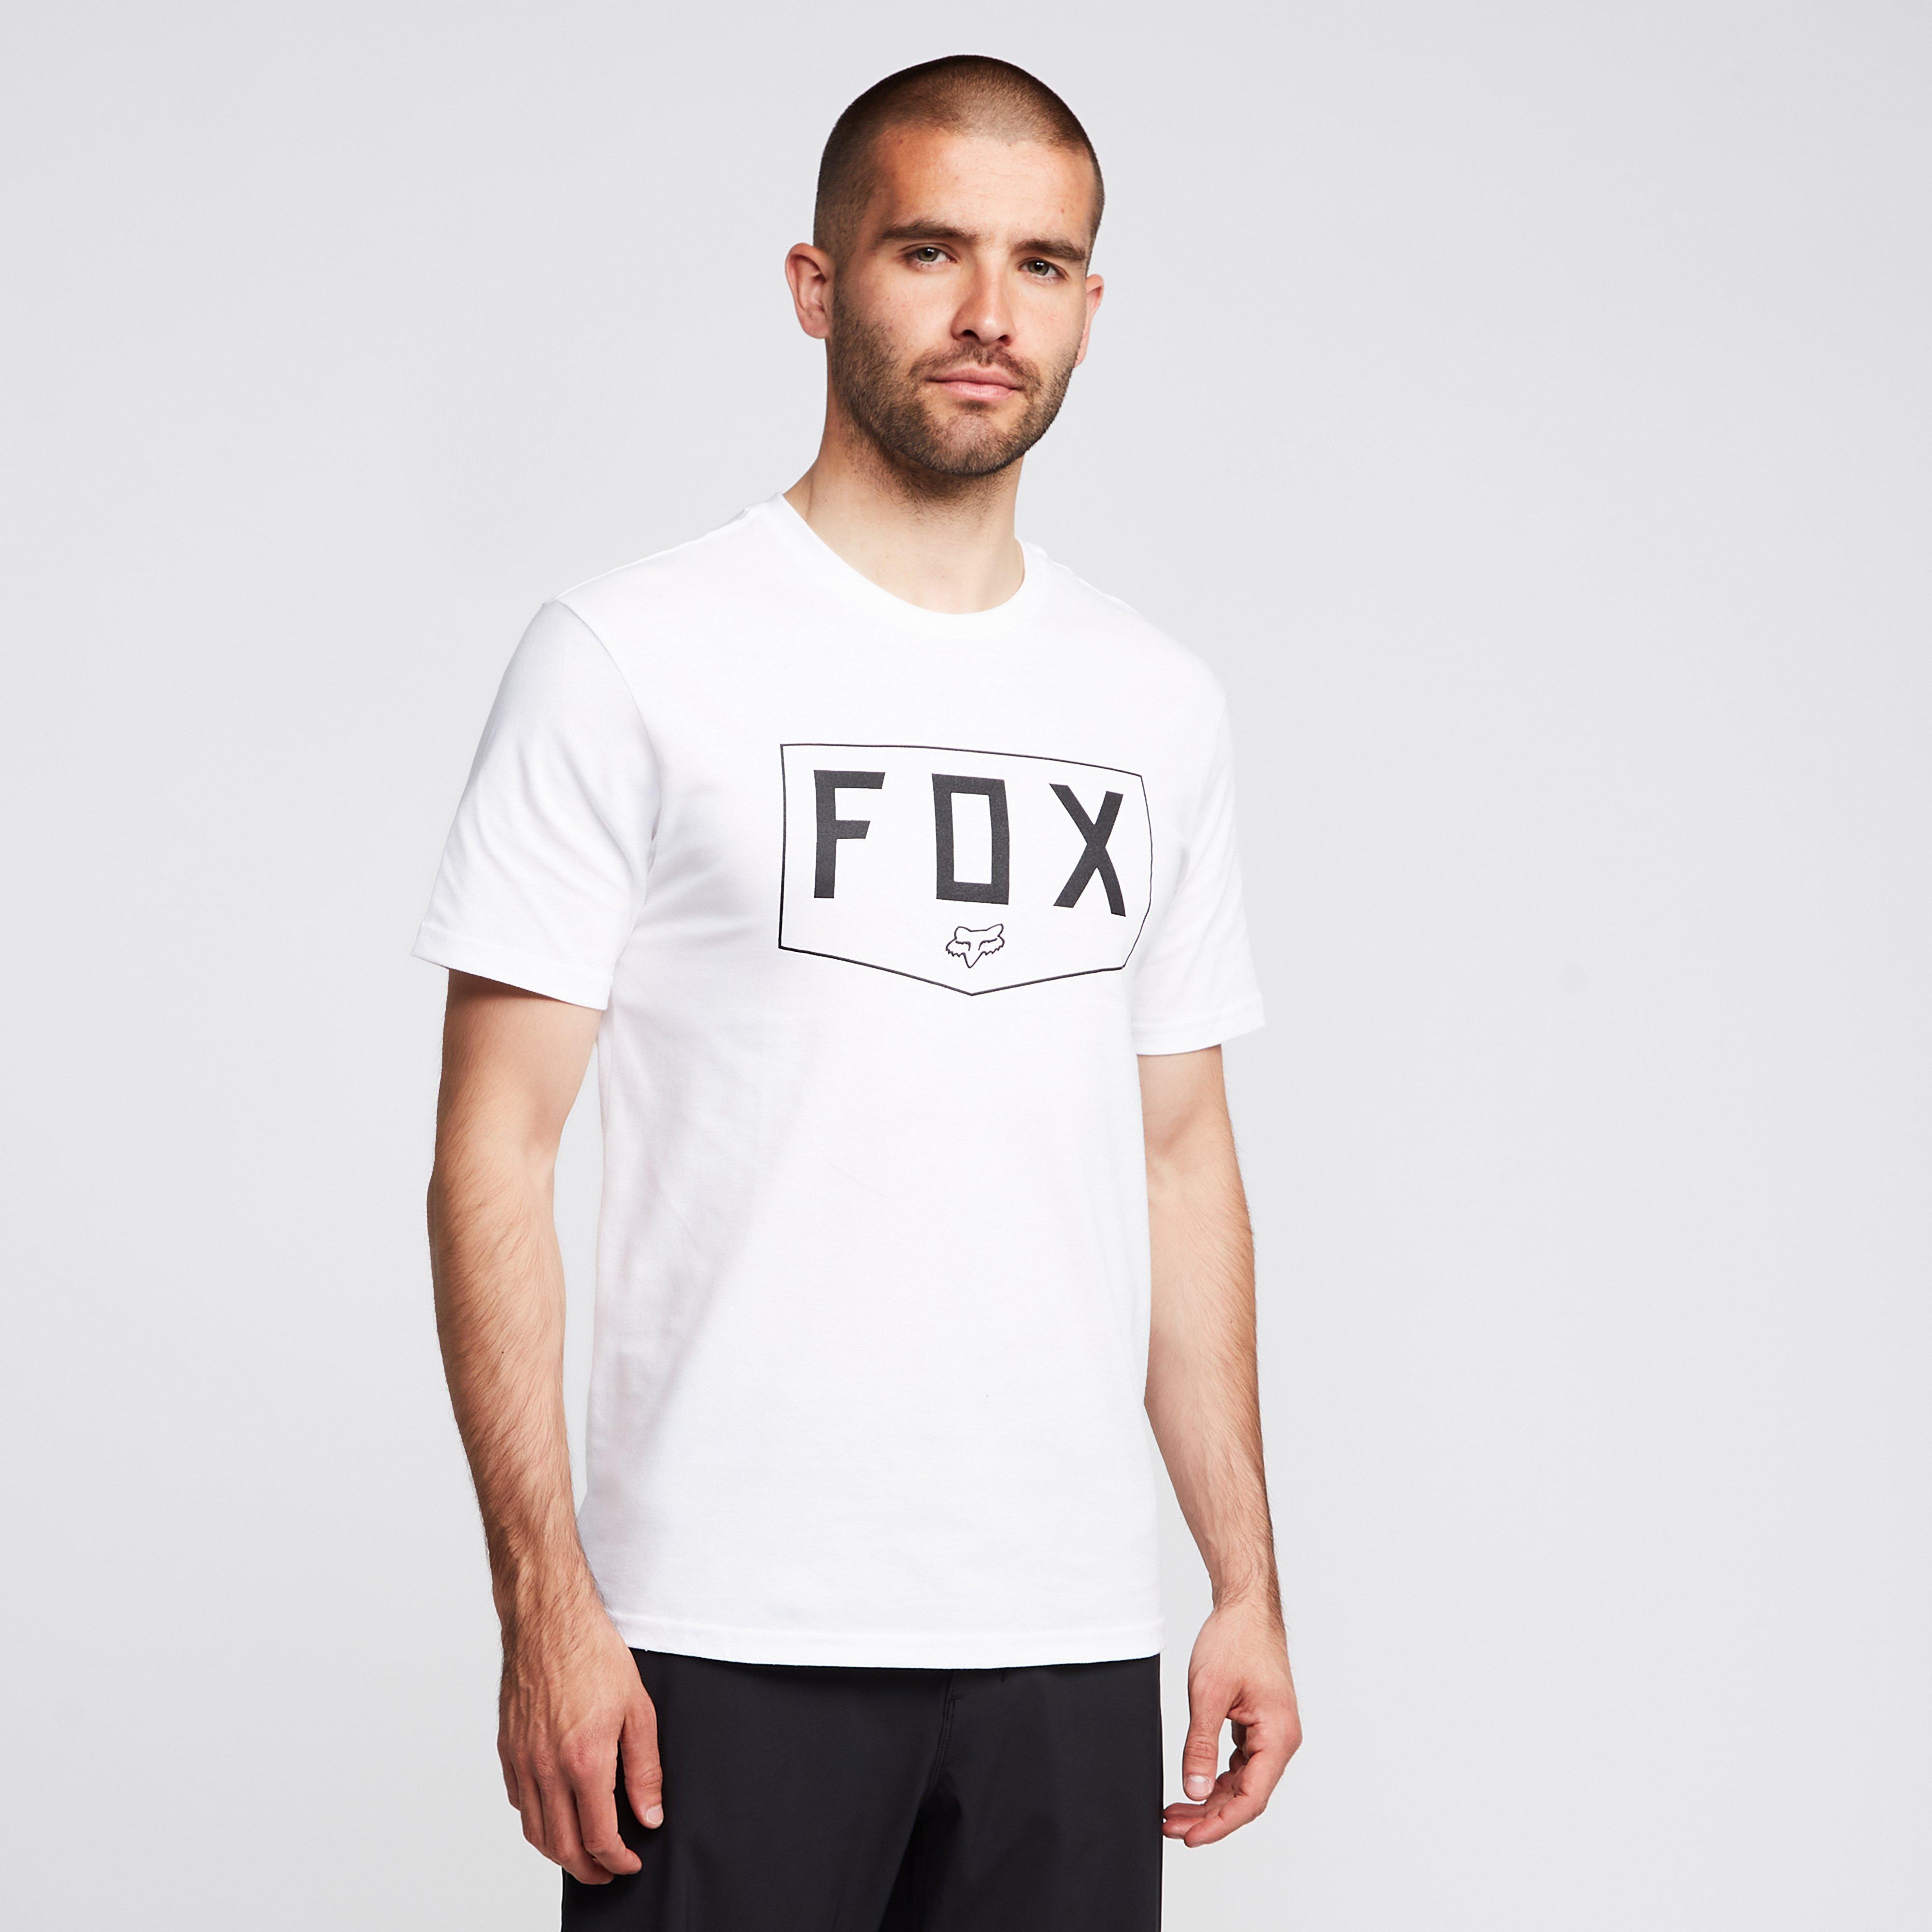 FOX Fox Shield Short Sleeve Premium Tee, White